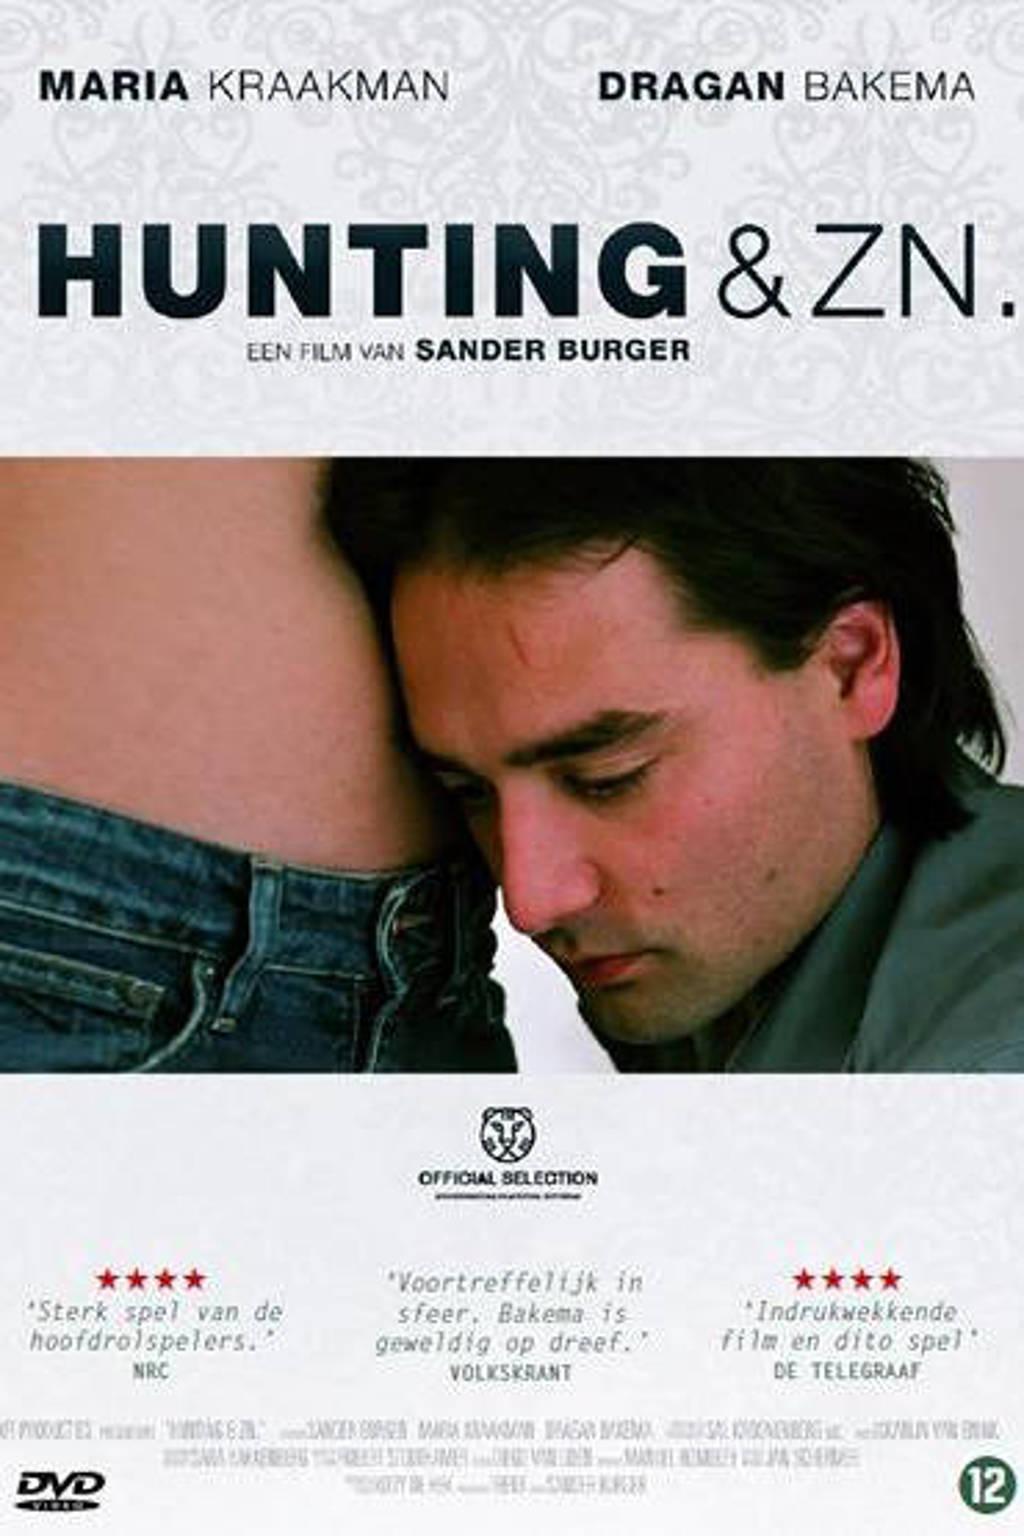 Hunting & zn (DVD)